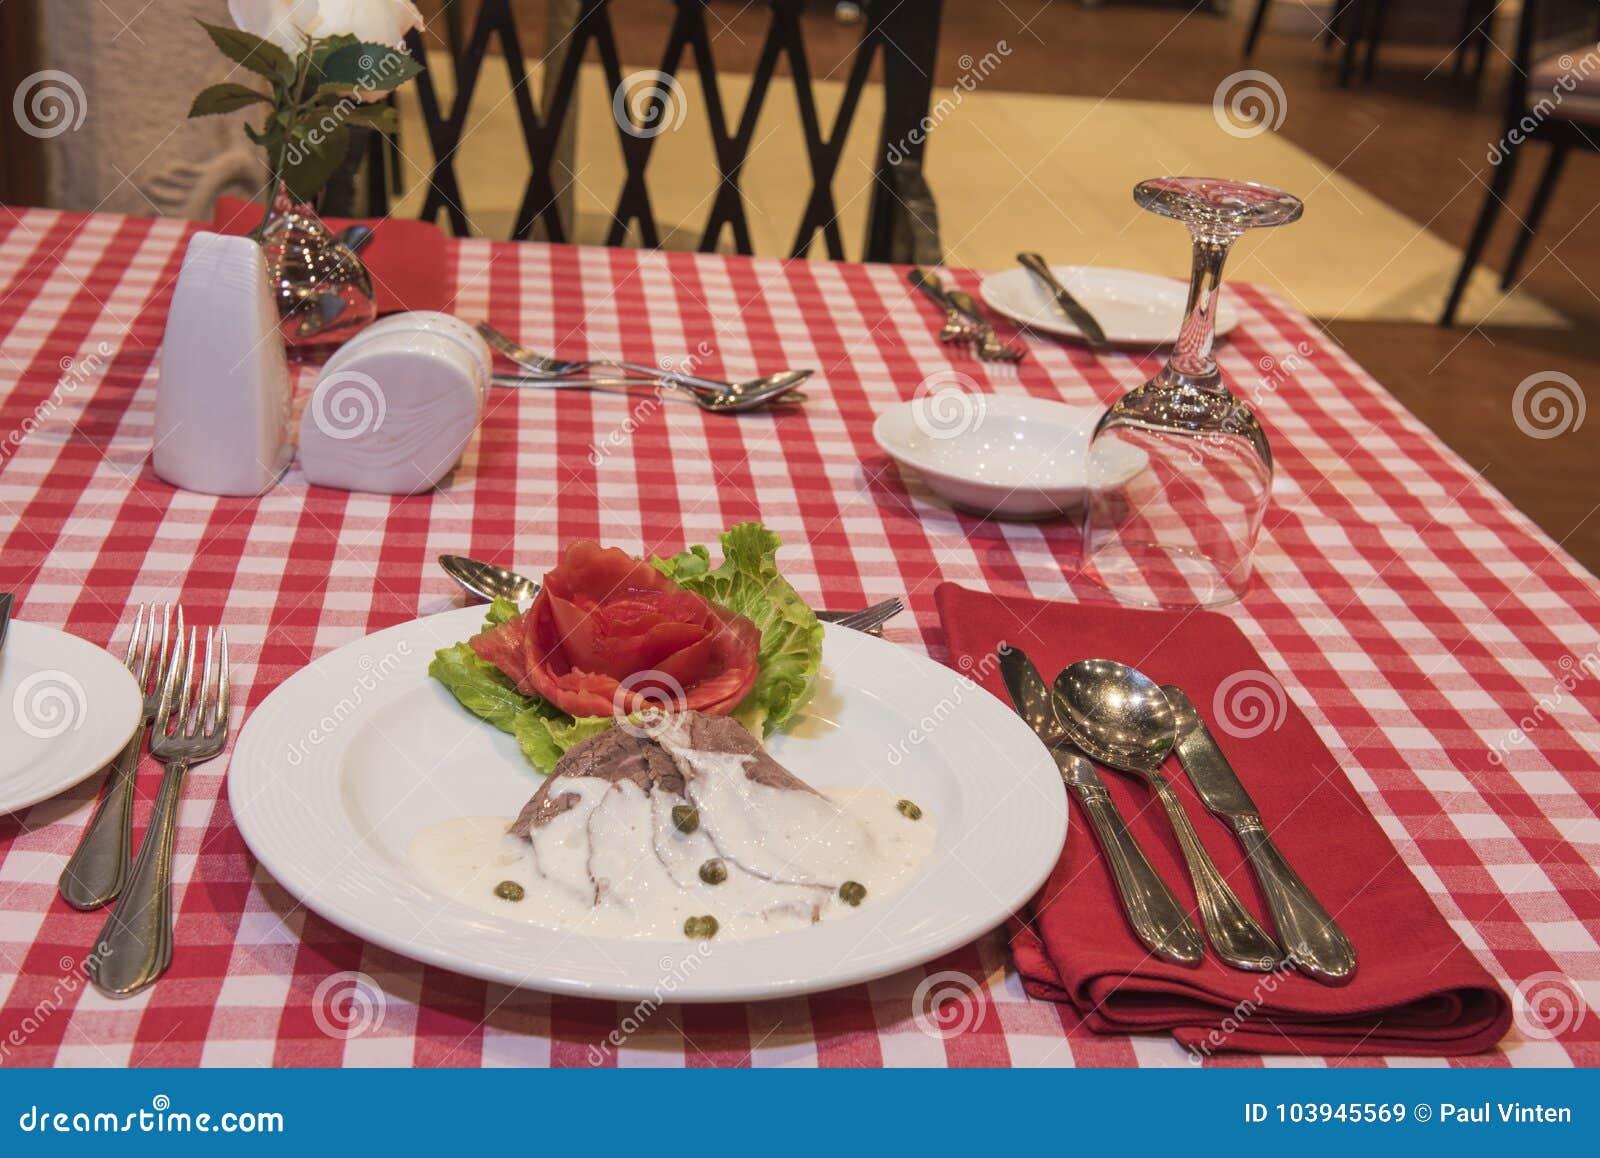 Roast beef in white sauce a la carte meal